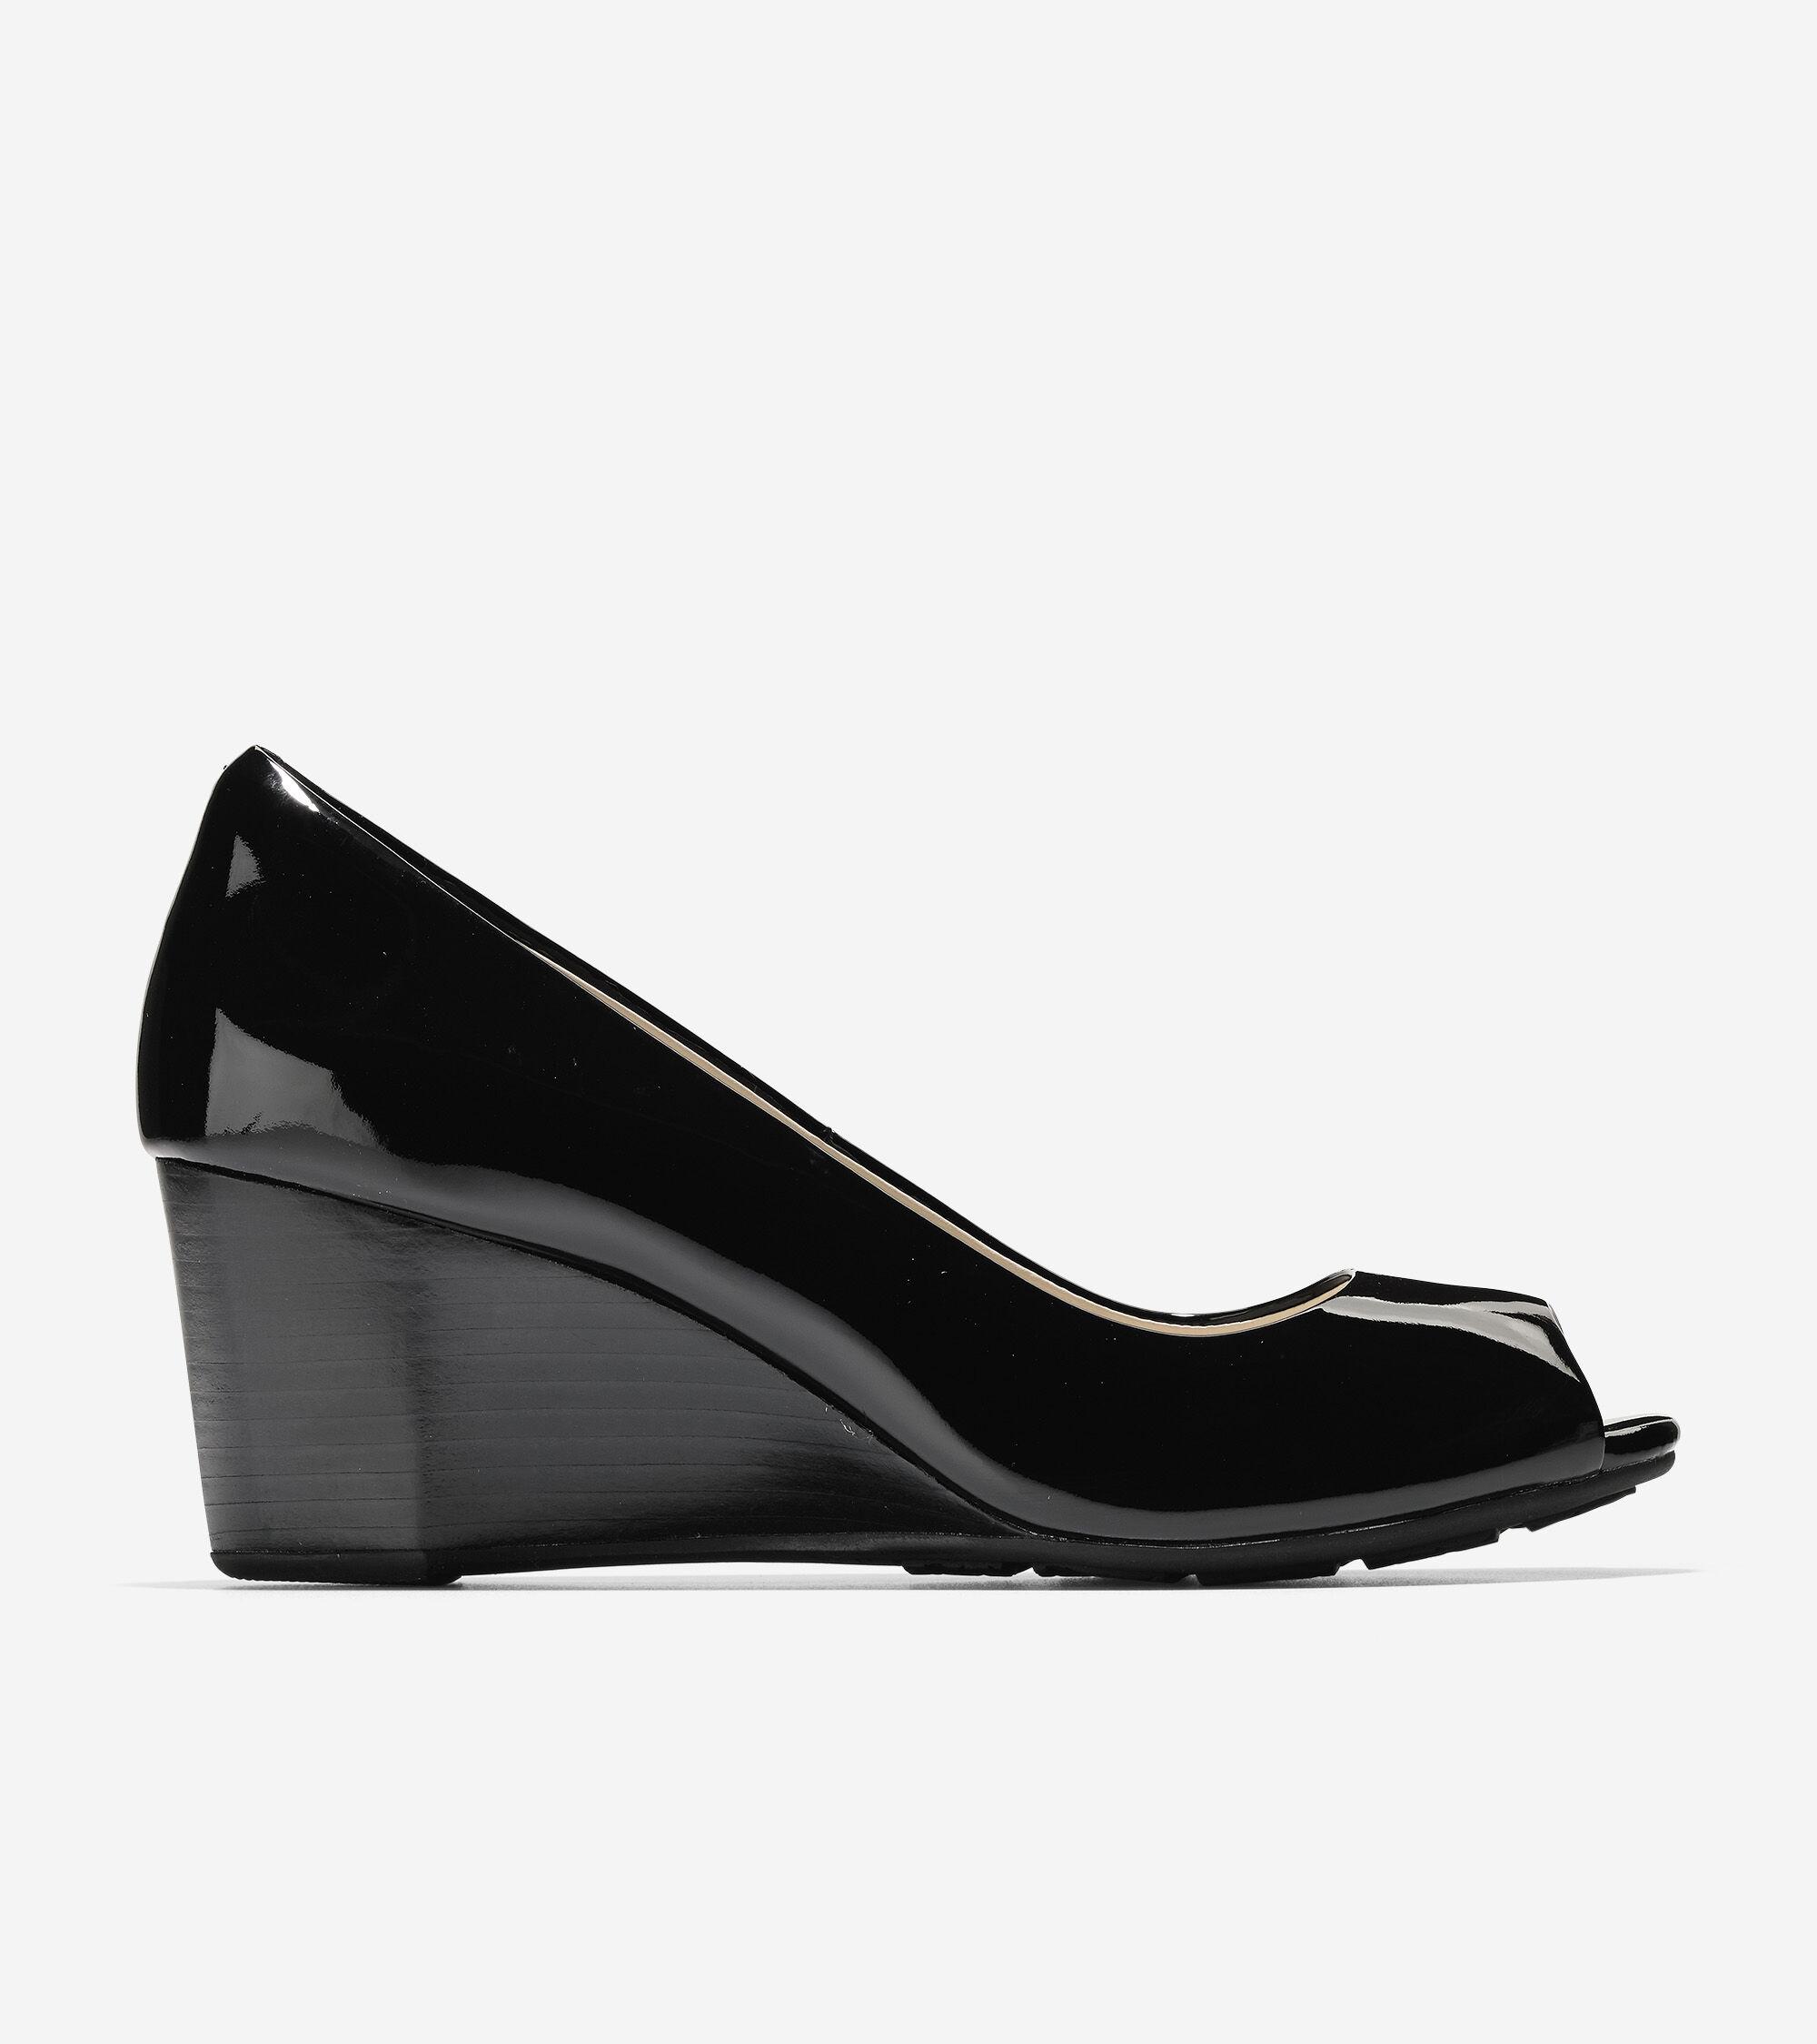 Cole Haan Women S Shoes Cole Haan Shoes Boots Sandals